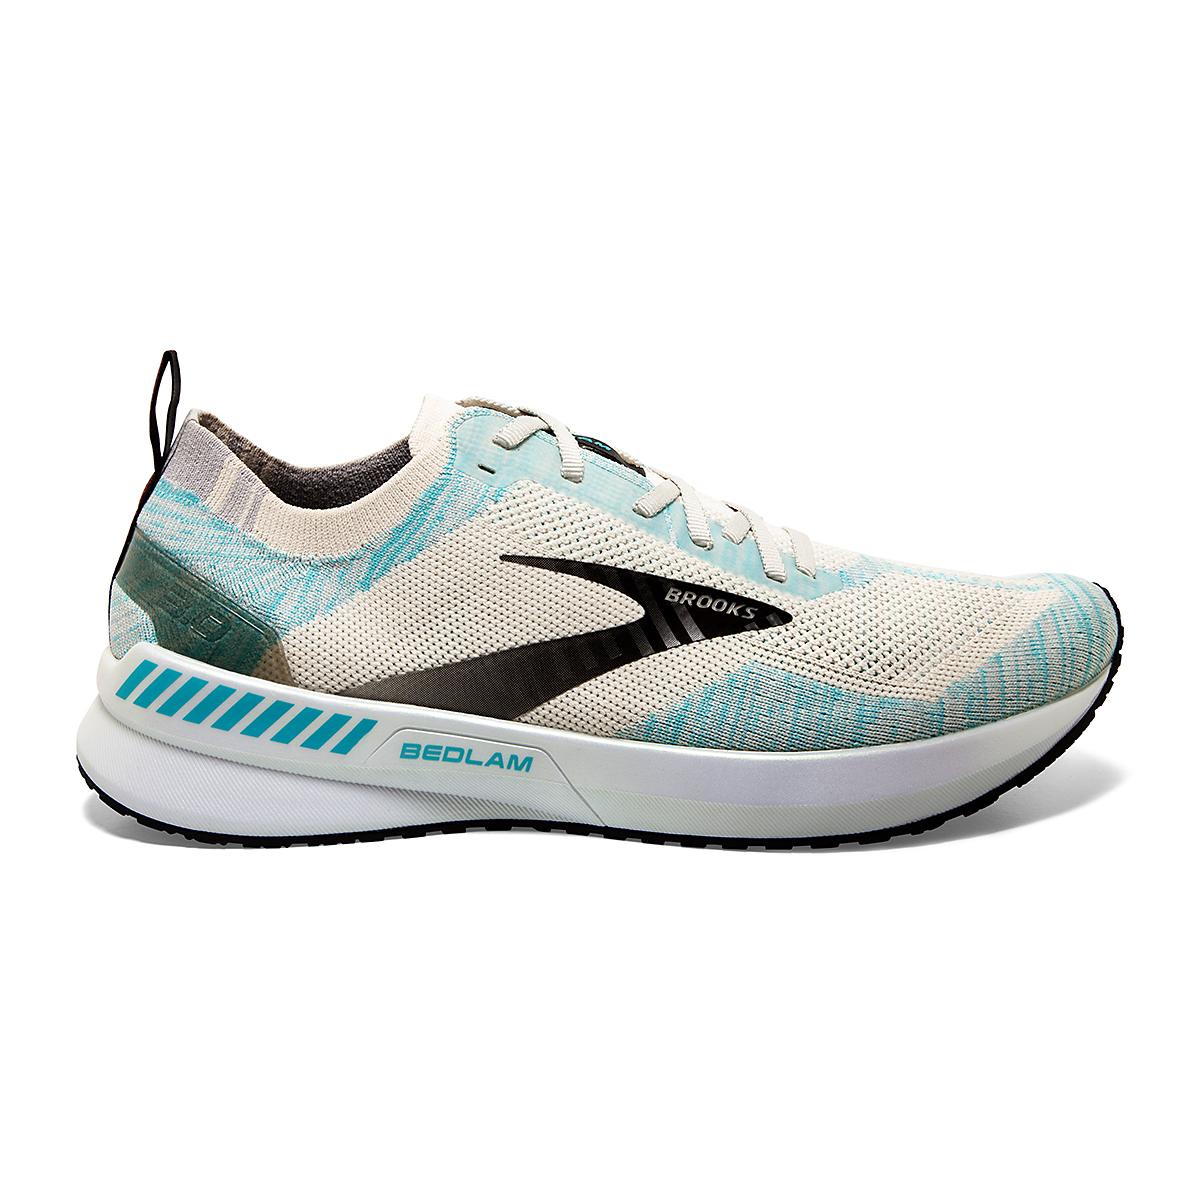 Men's Brooks Bedlam 3 Running Shoe - Color: Jet Stream/Antarctica/Capri - Size: 7 - Width: Regular, Jet Stream/Antarctica/Capri, large, image 1